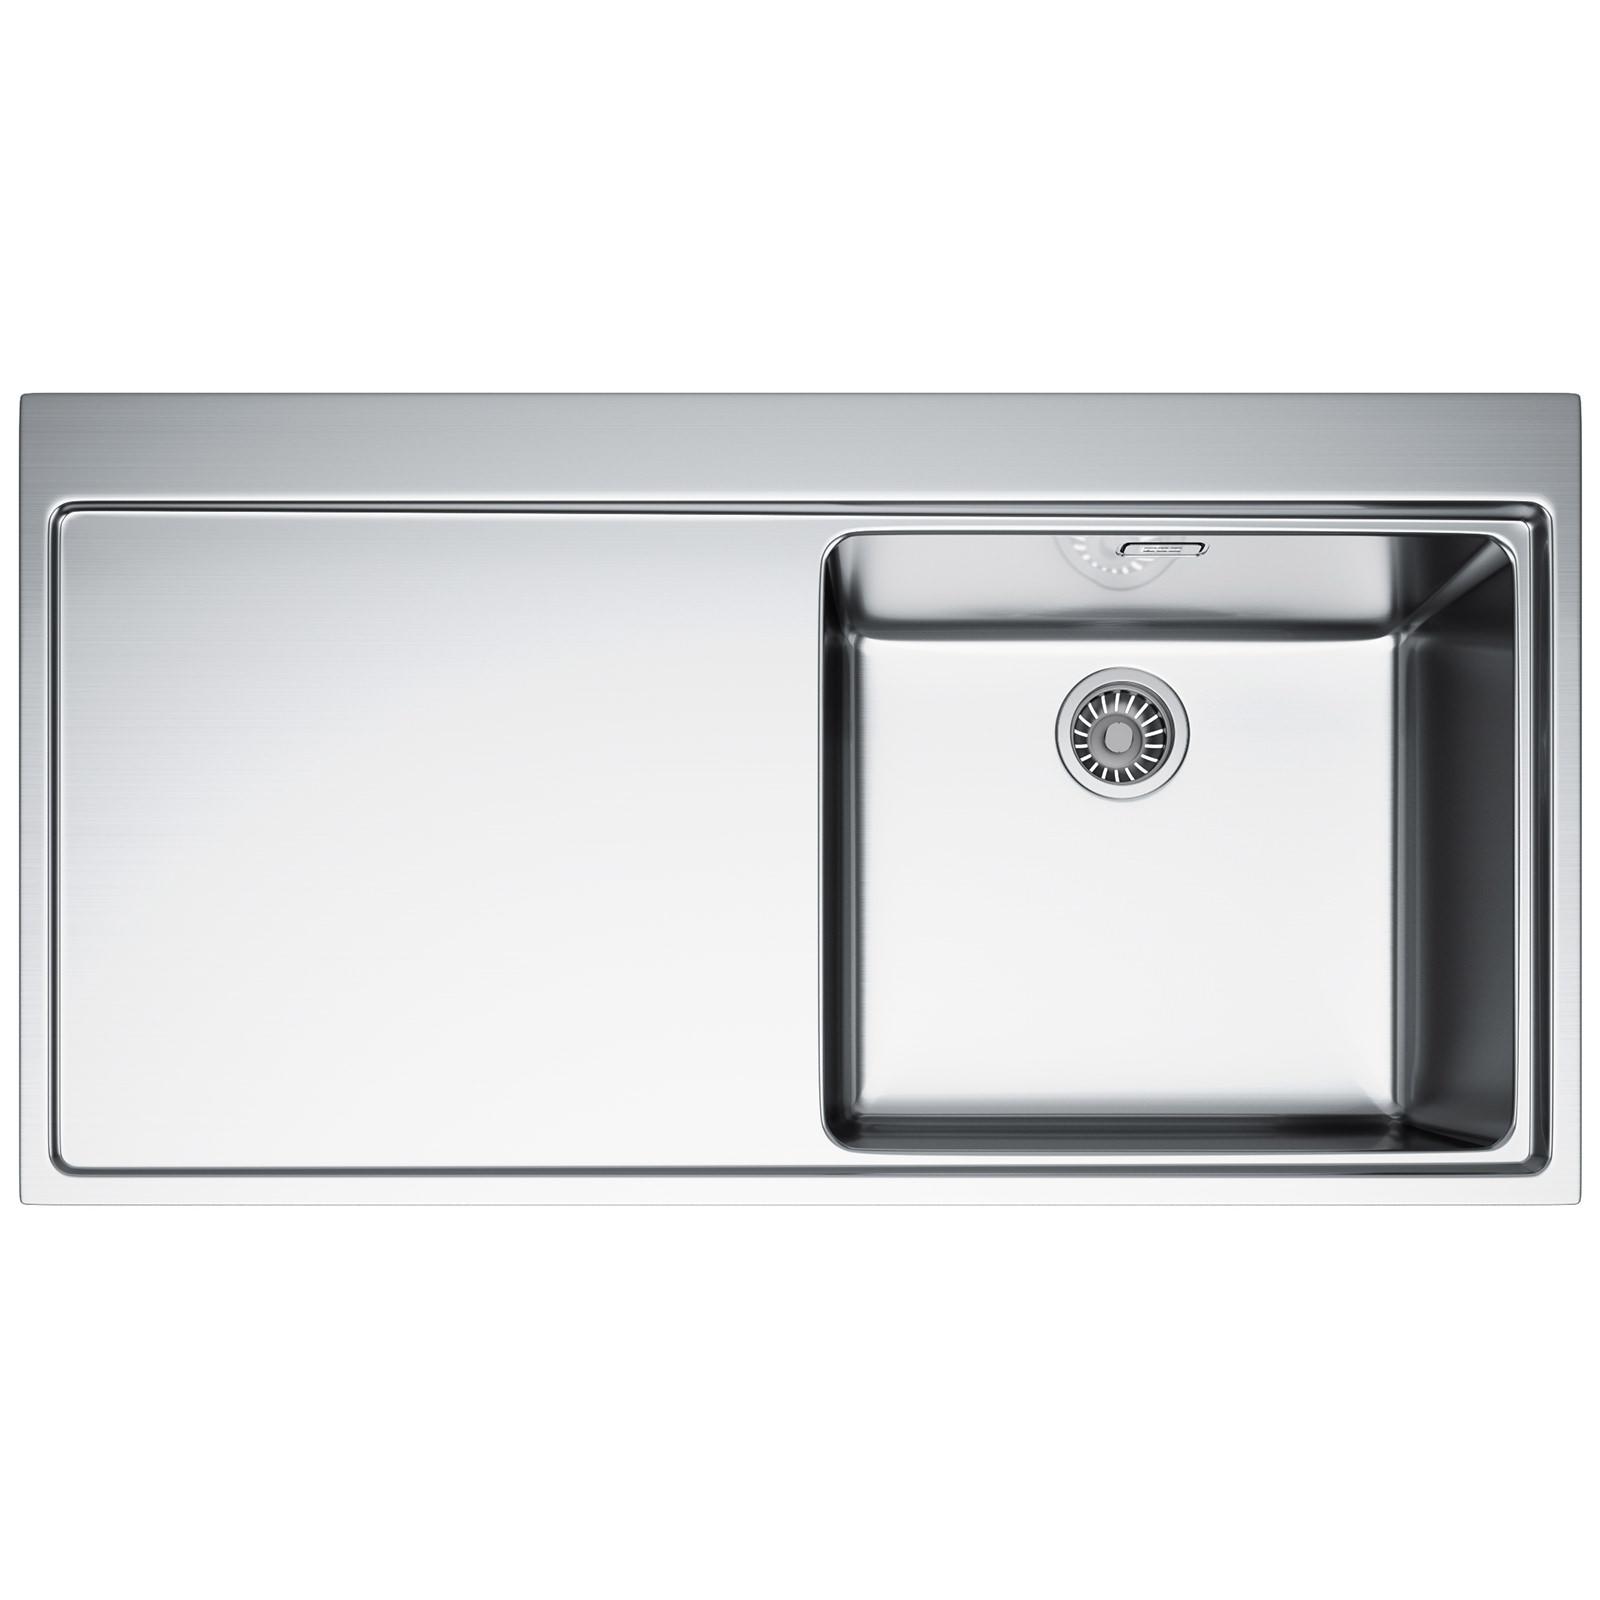 Franke Sink Tops : Franke Mythos MMX 211 Slim-Top 1.0 Bowl Stainless Steel Inset Sink ...